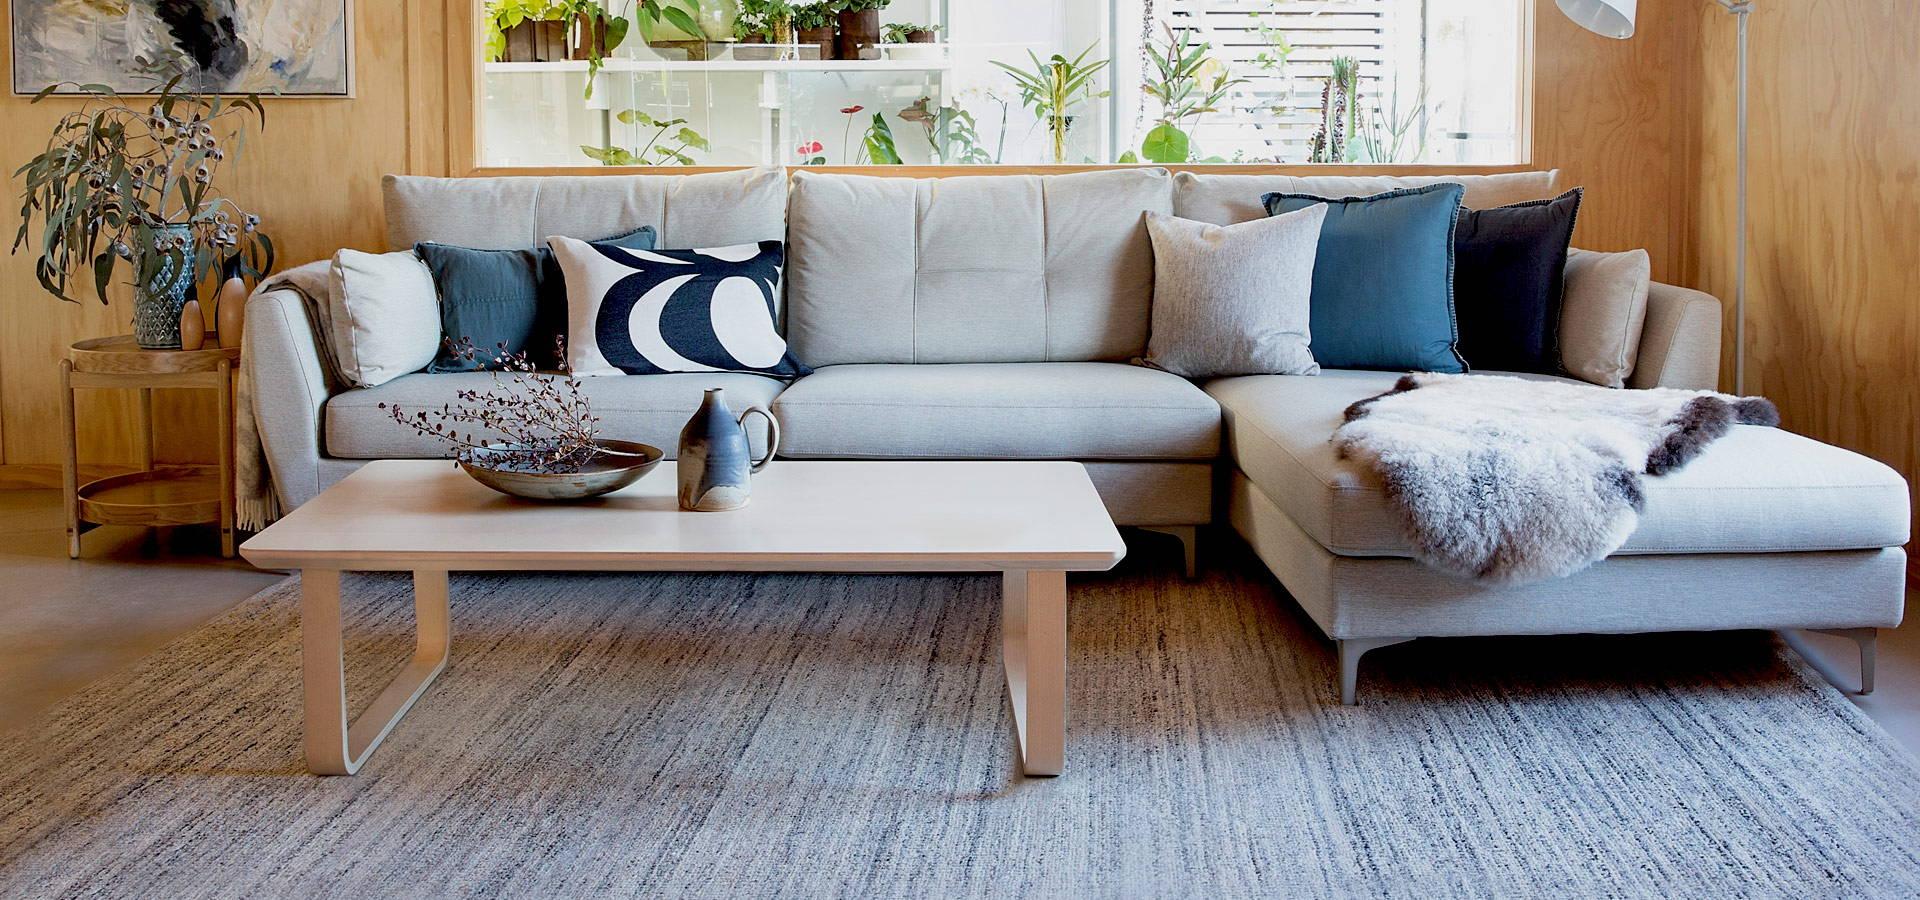 Lounge Room Furniture The Modern Furniture Store